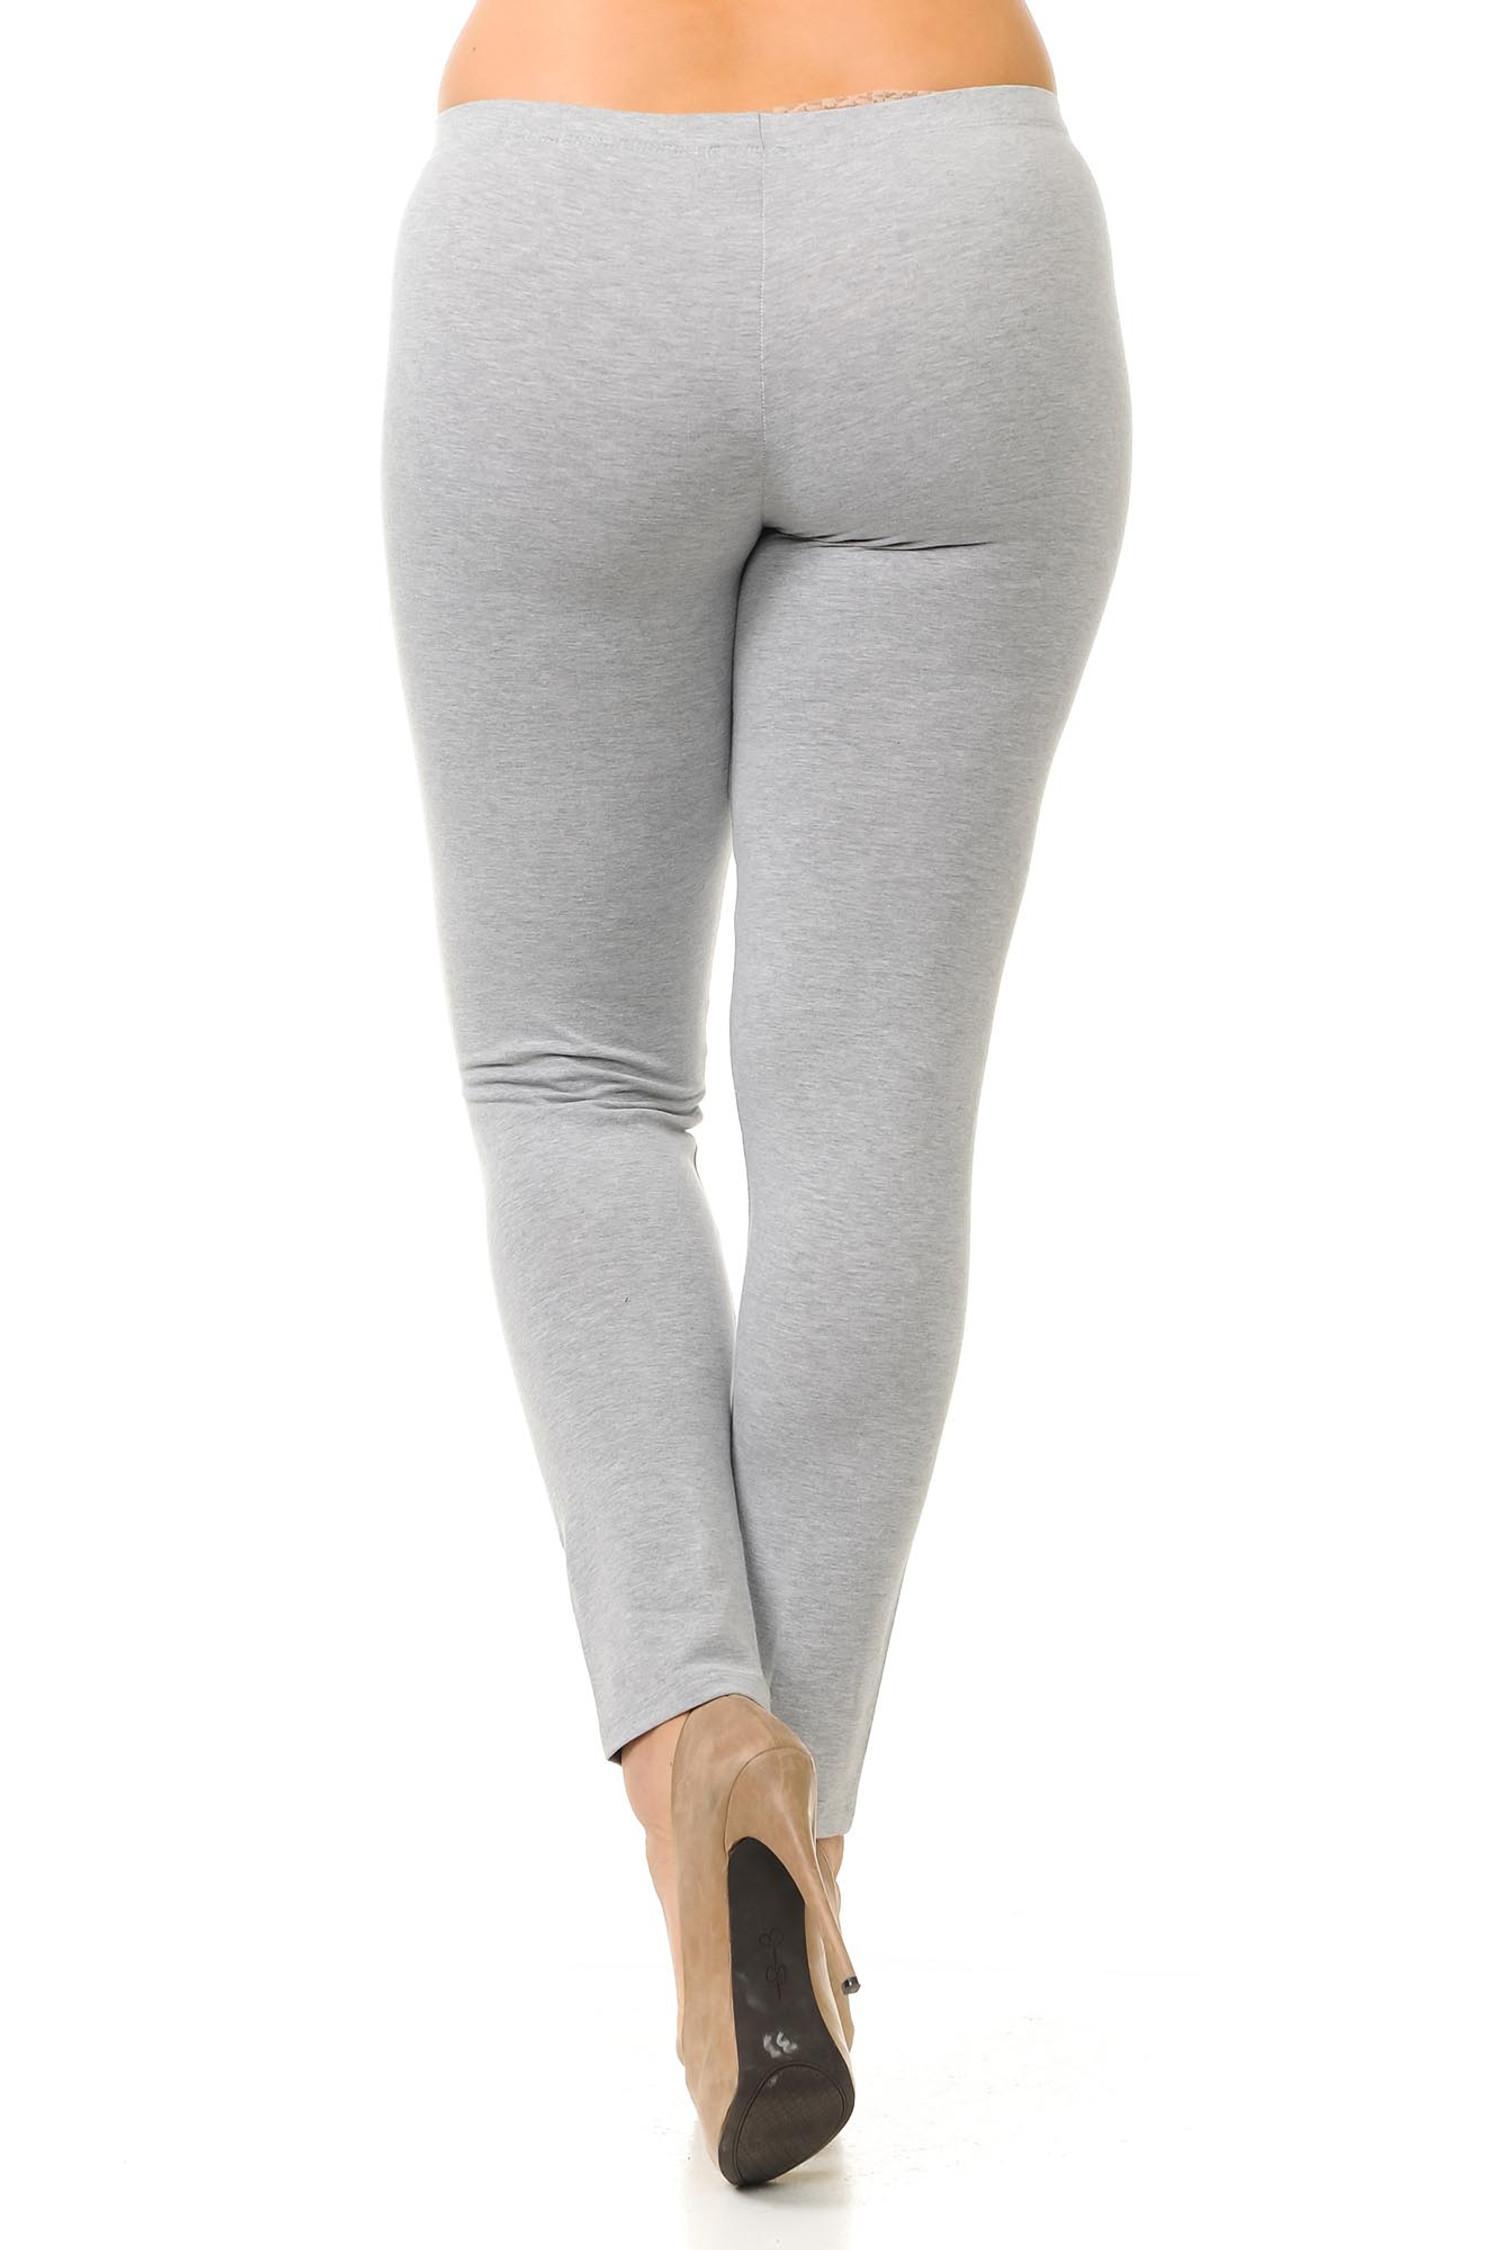 Rear image of heather gray full length USA cotton plus size leggings.